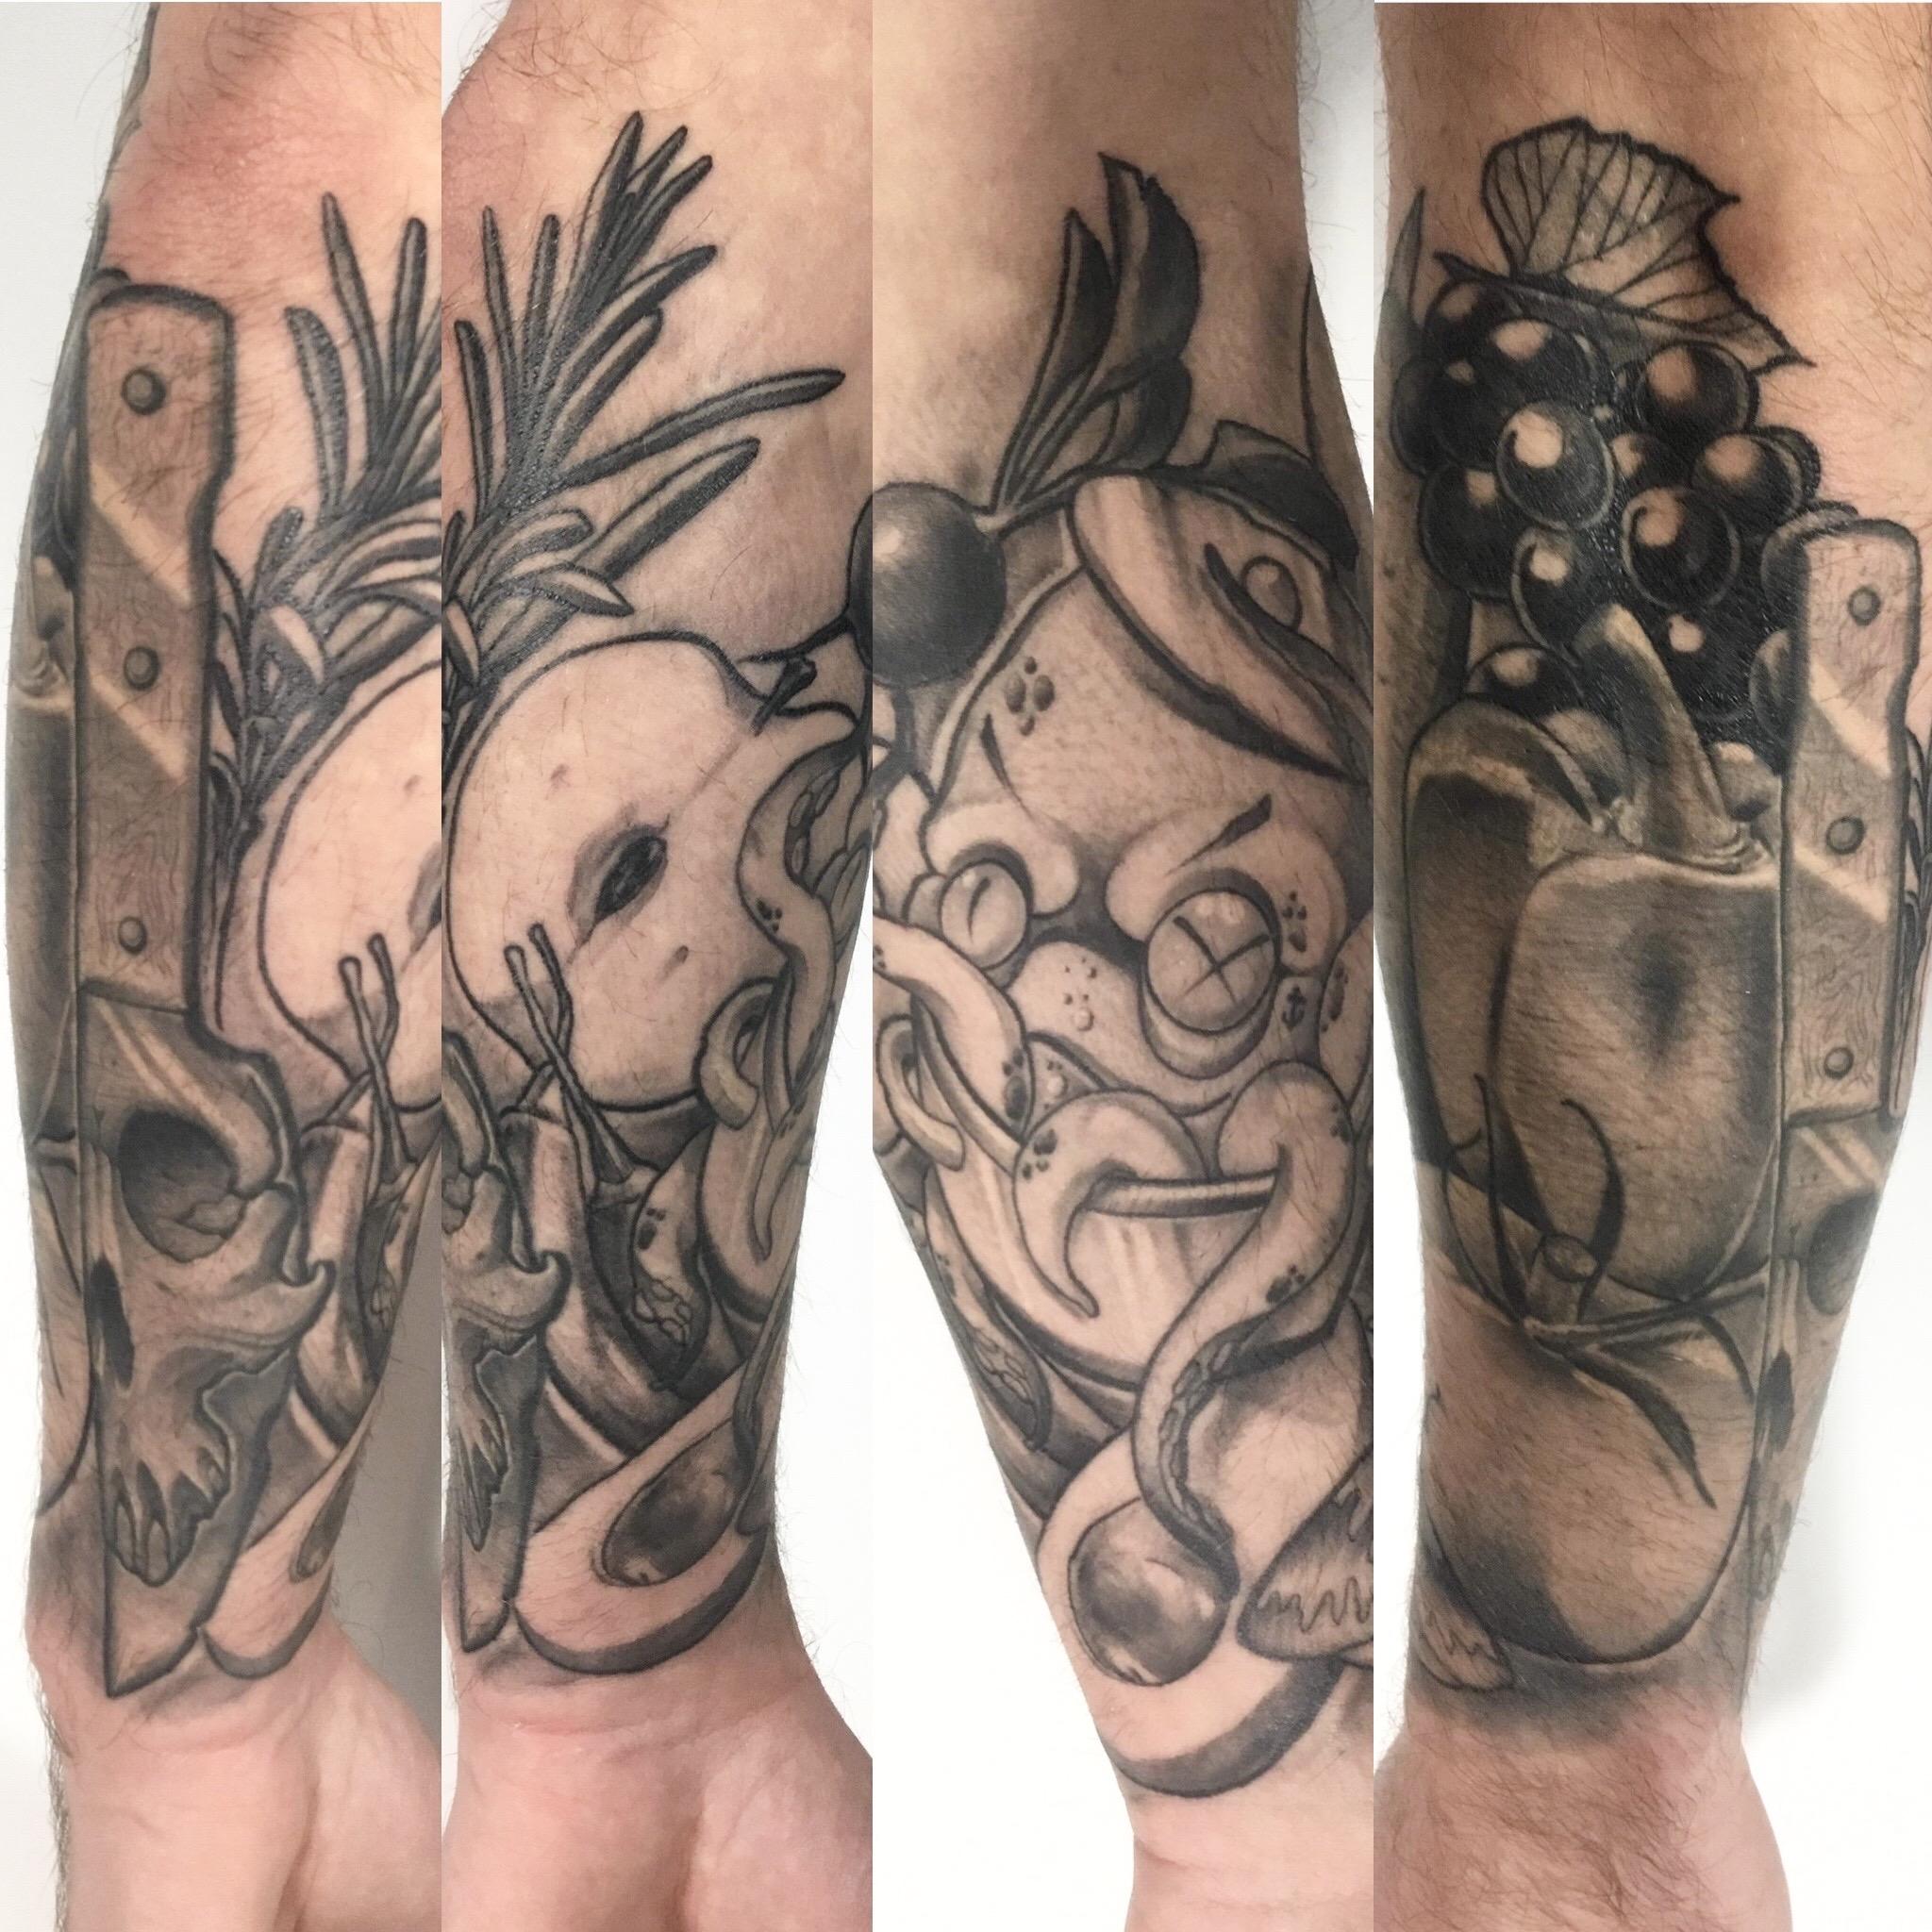 Inksearch tattoo AYOR_TATTOO